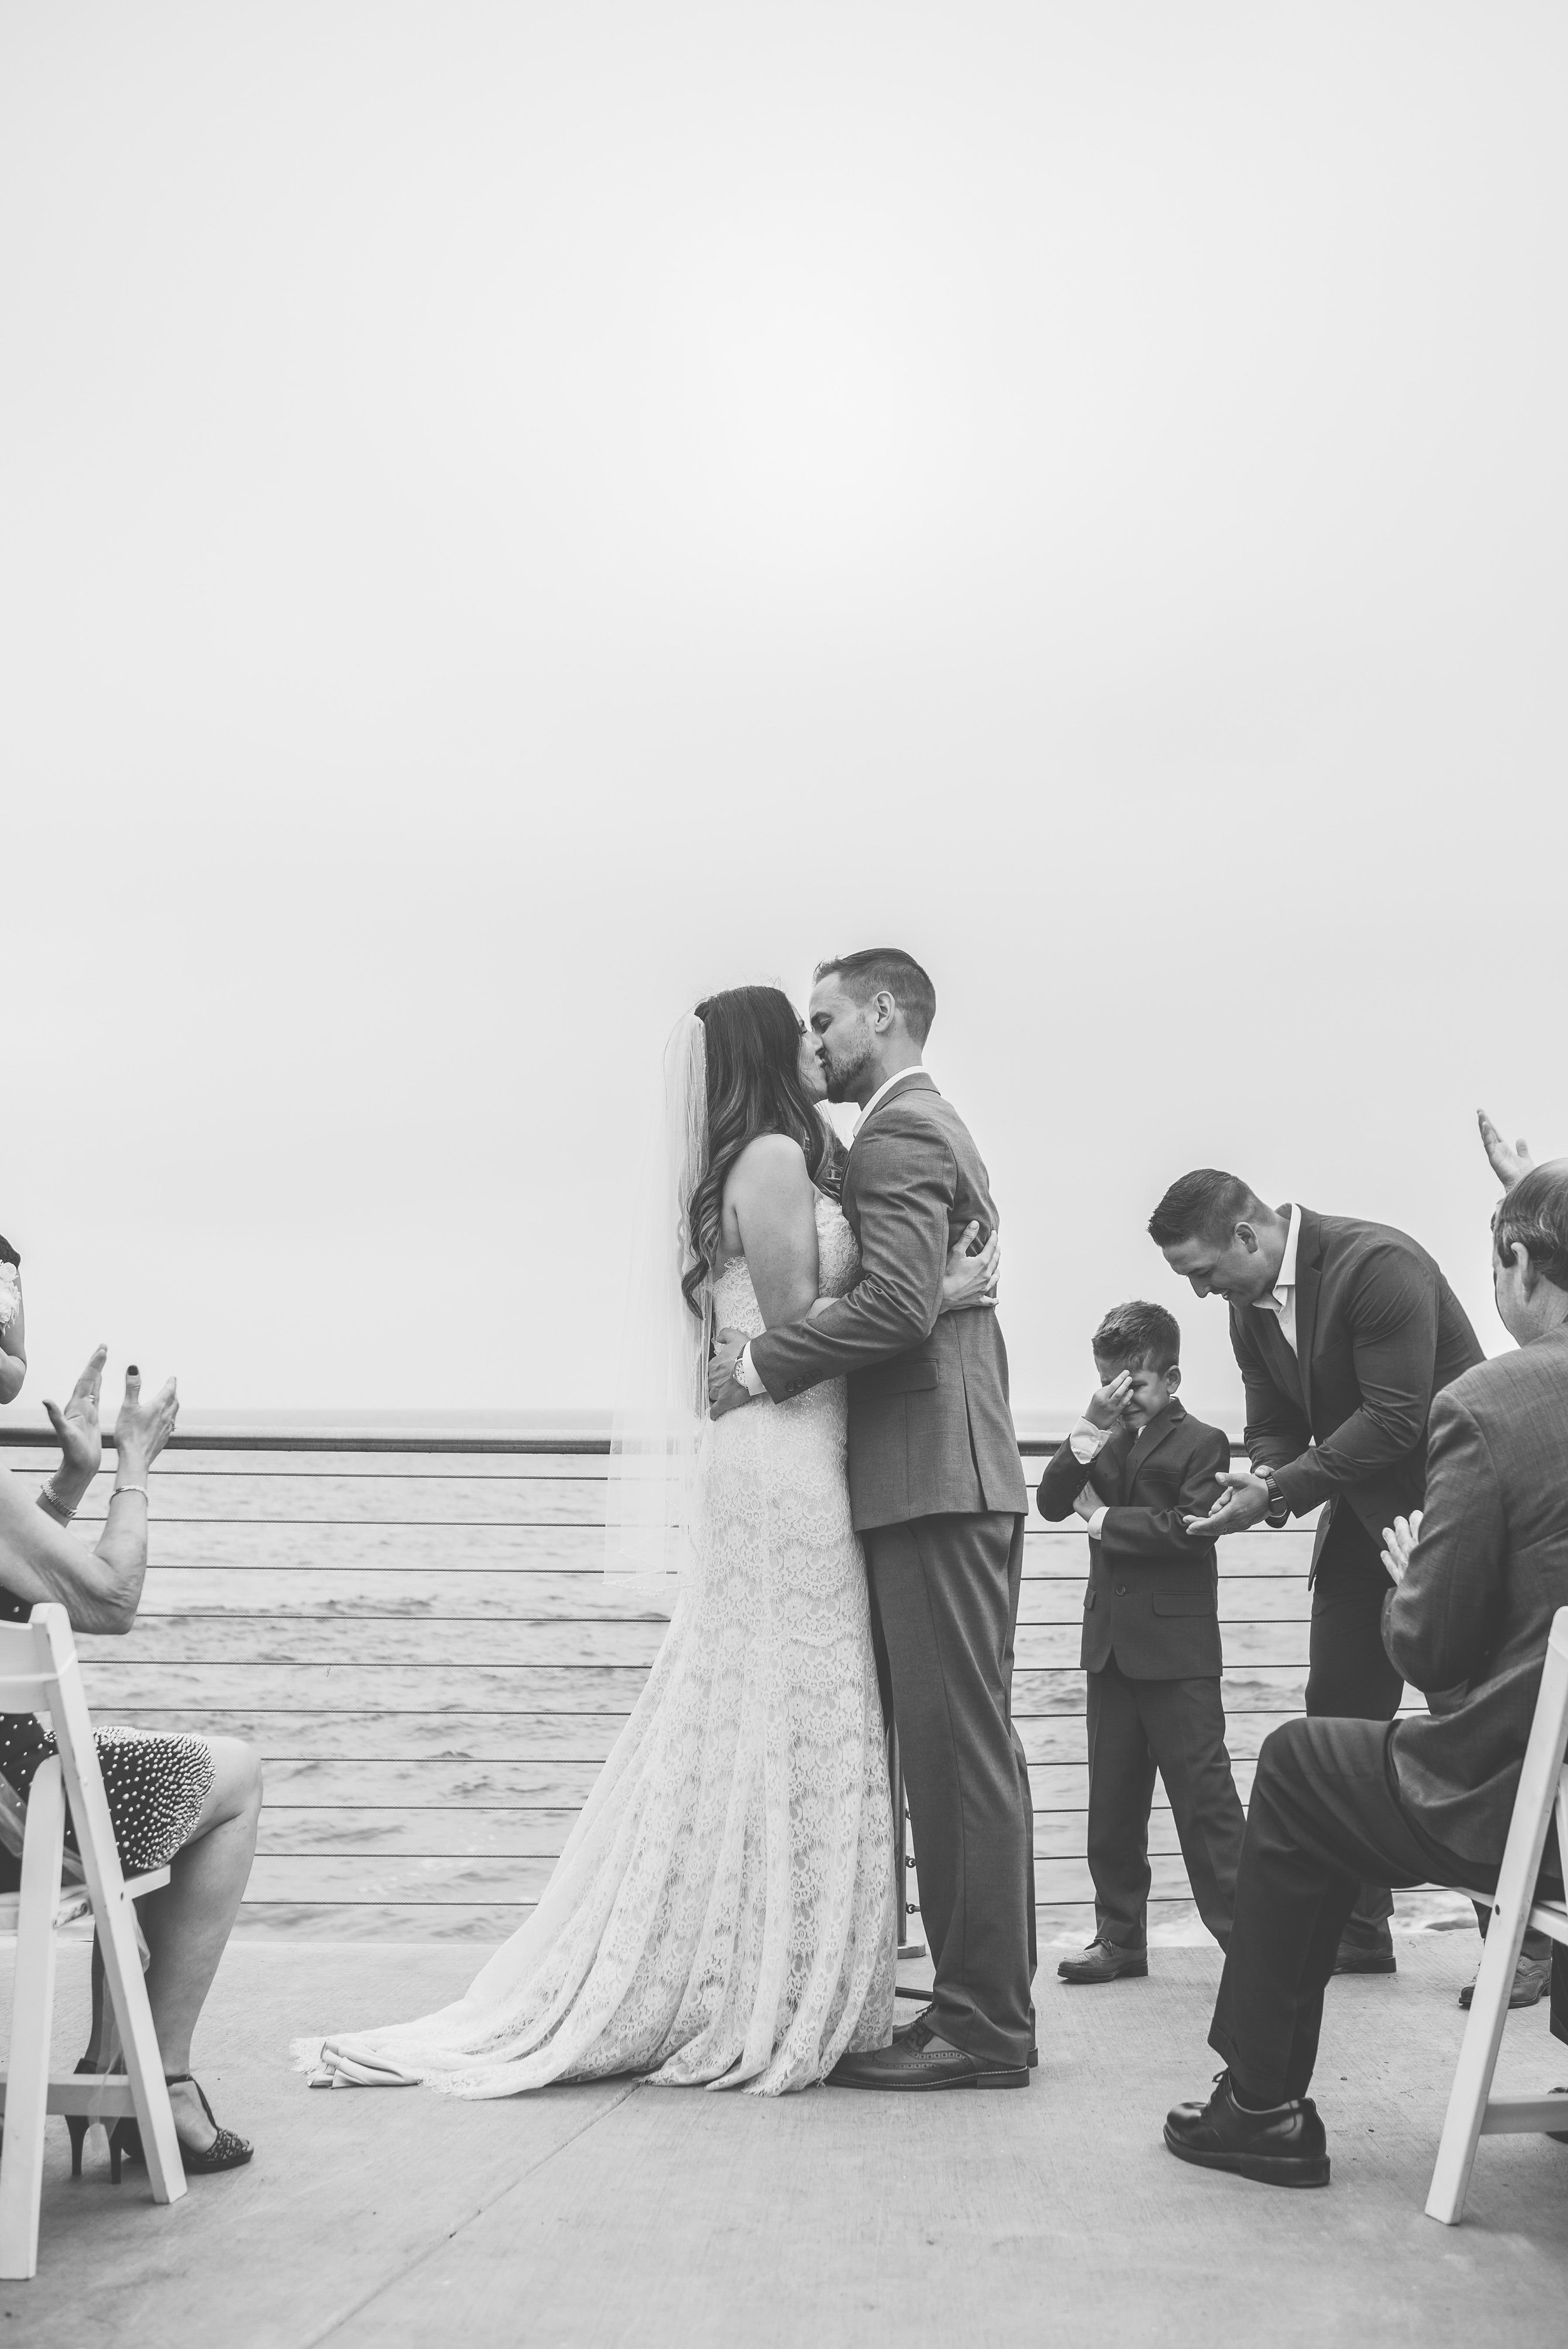 weddingwebsitesmallerpics-345.jpg